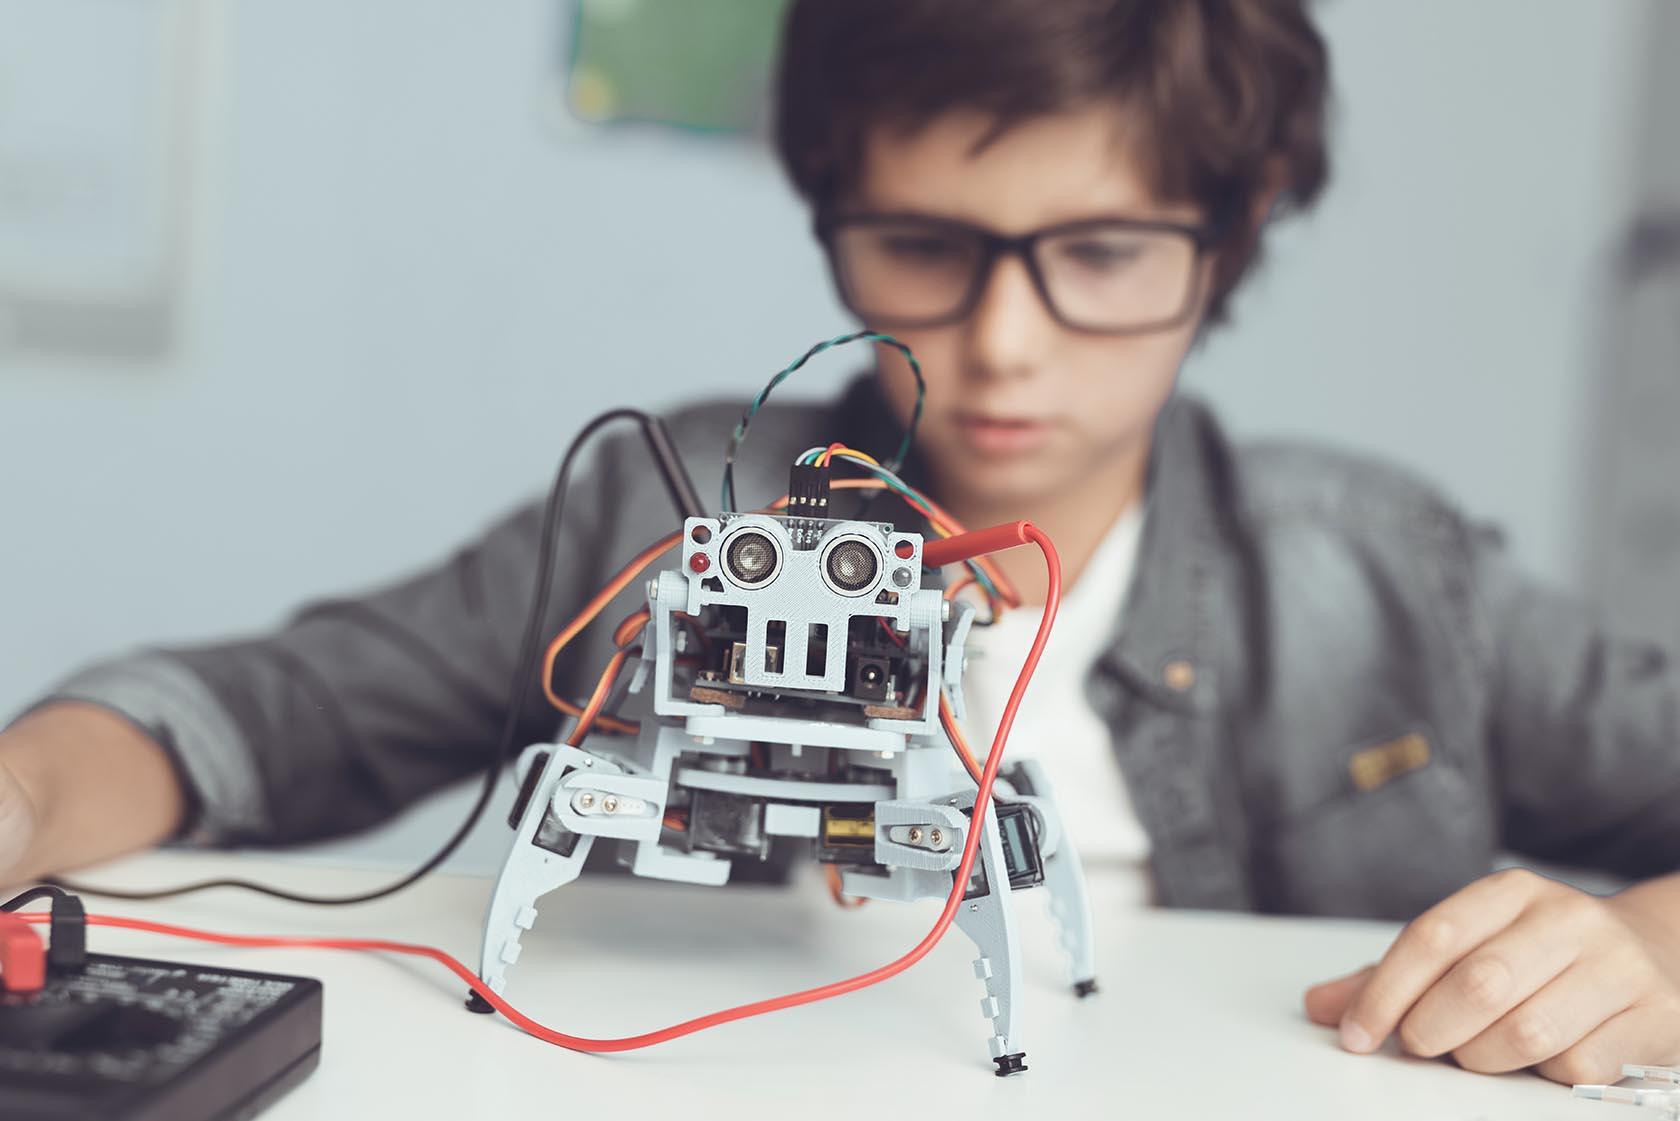 Digitales Lernen in der Schule